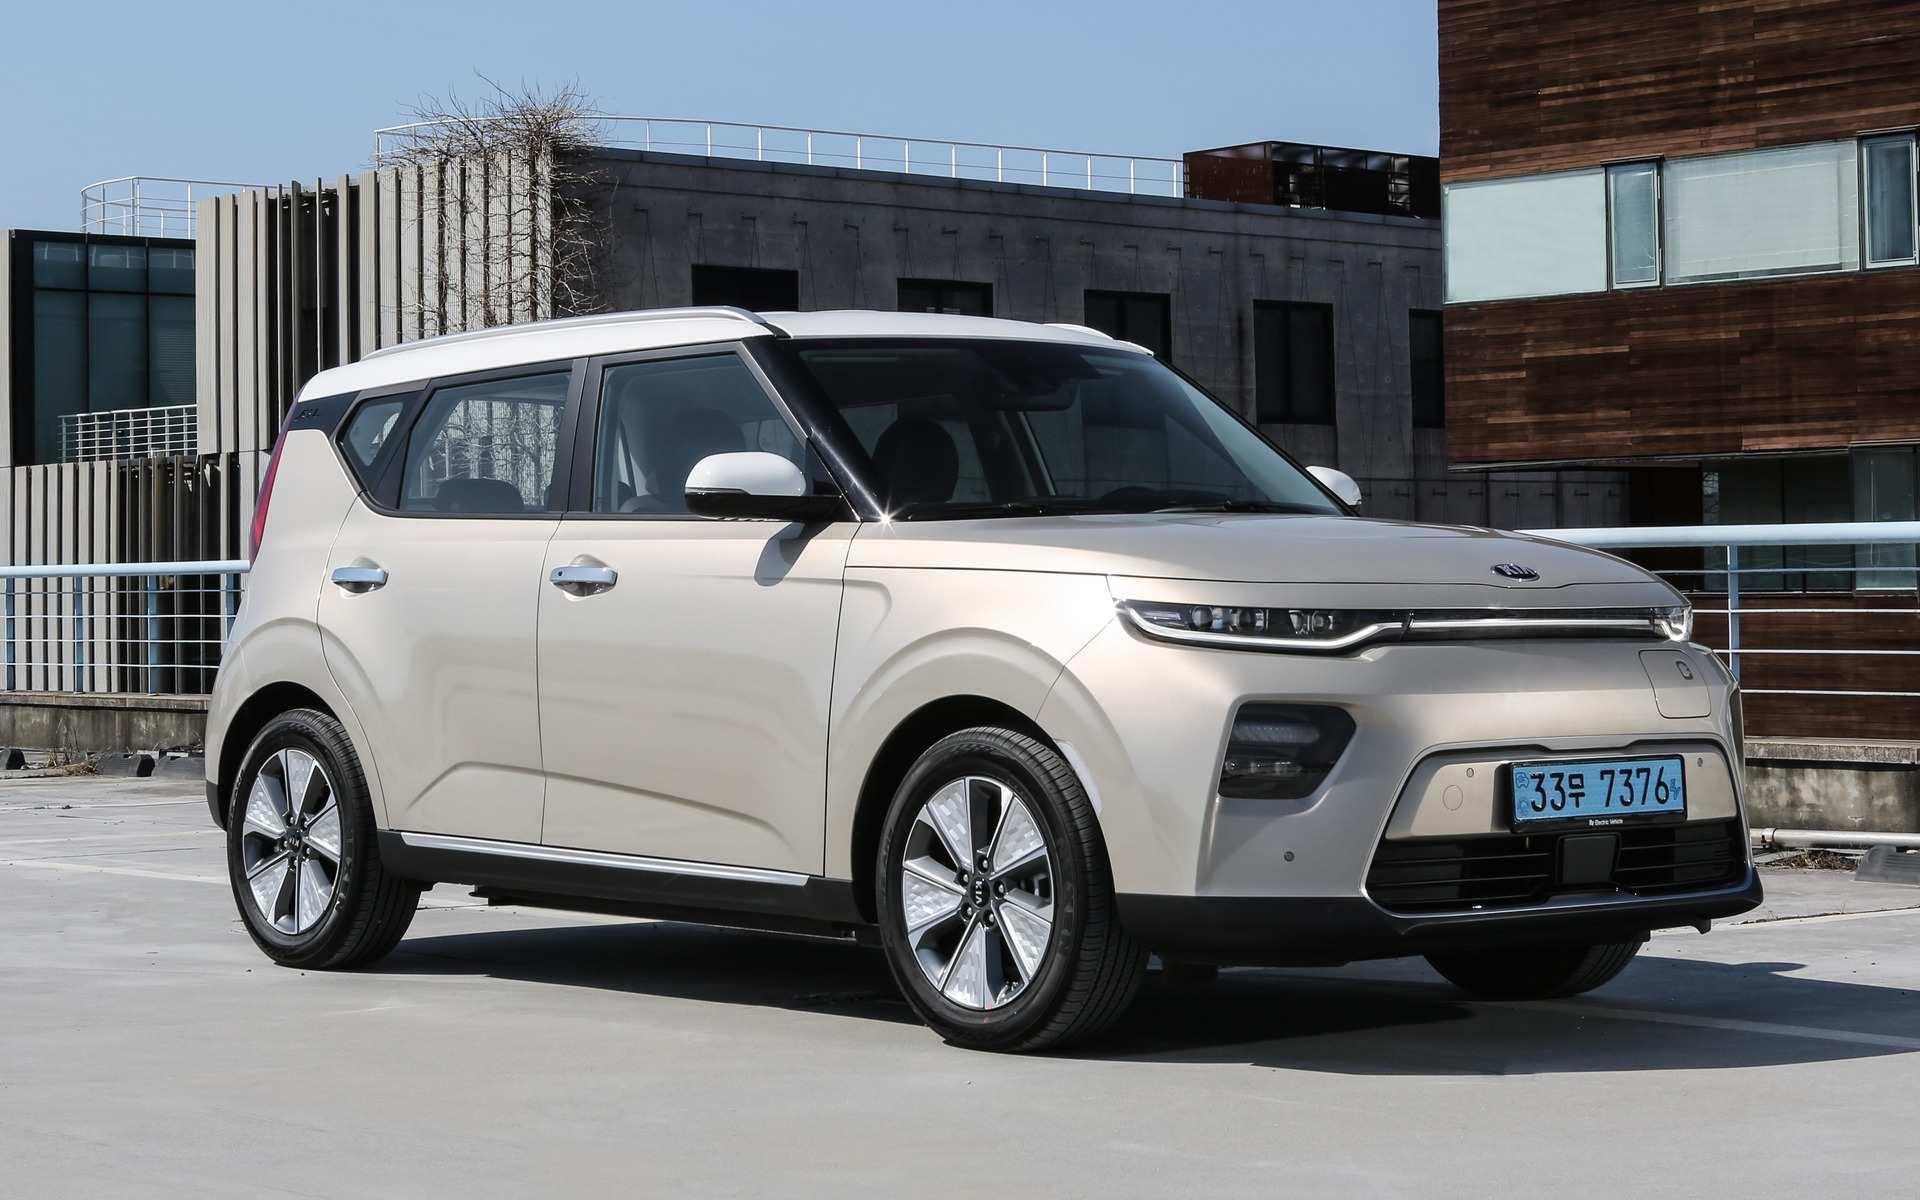 64 All New Kia Electric 2020 Redesign with Kia Electric 2020